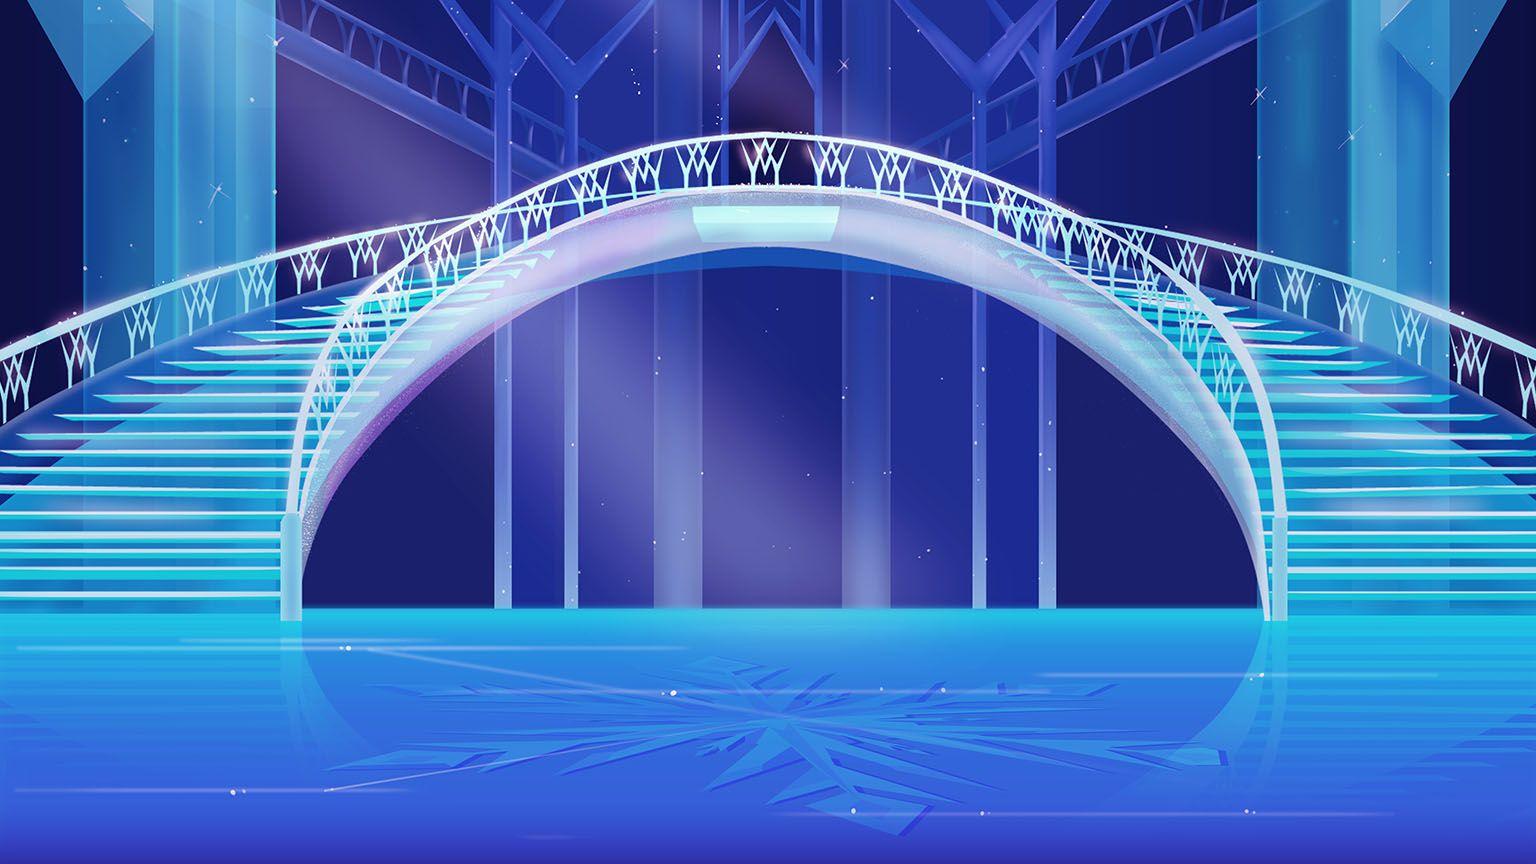 Disney Frozen Holiday Card Creator Frozen Background Episode Interactive Backgrounds Anime Background